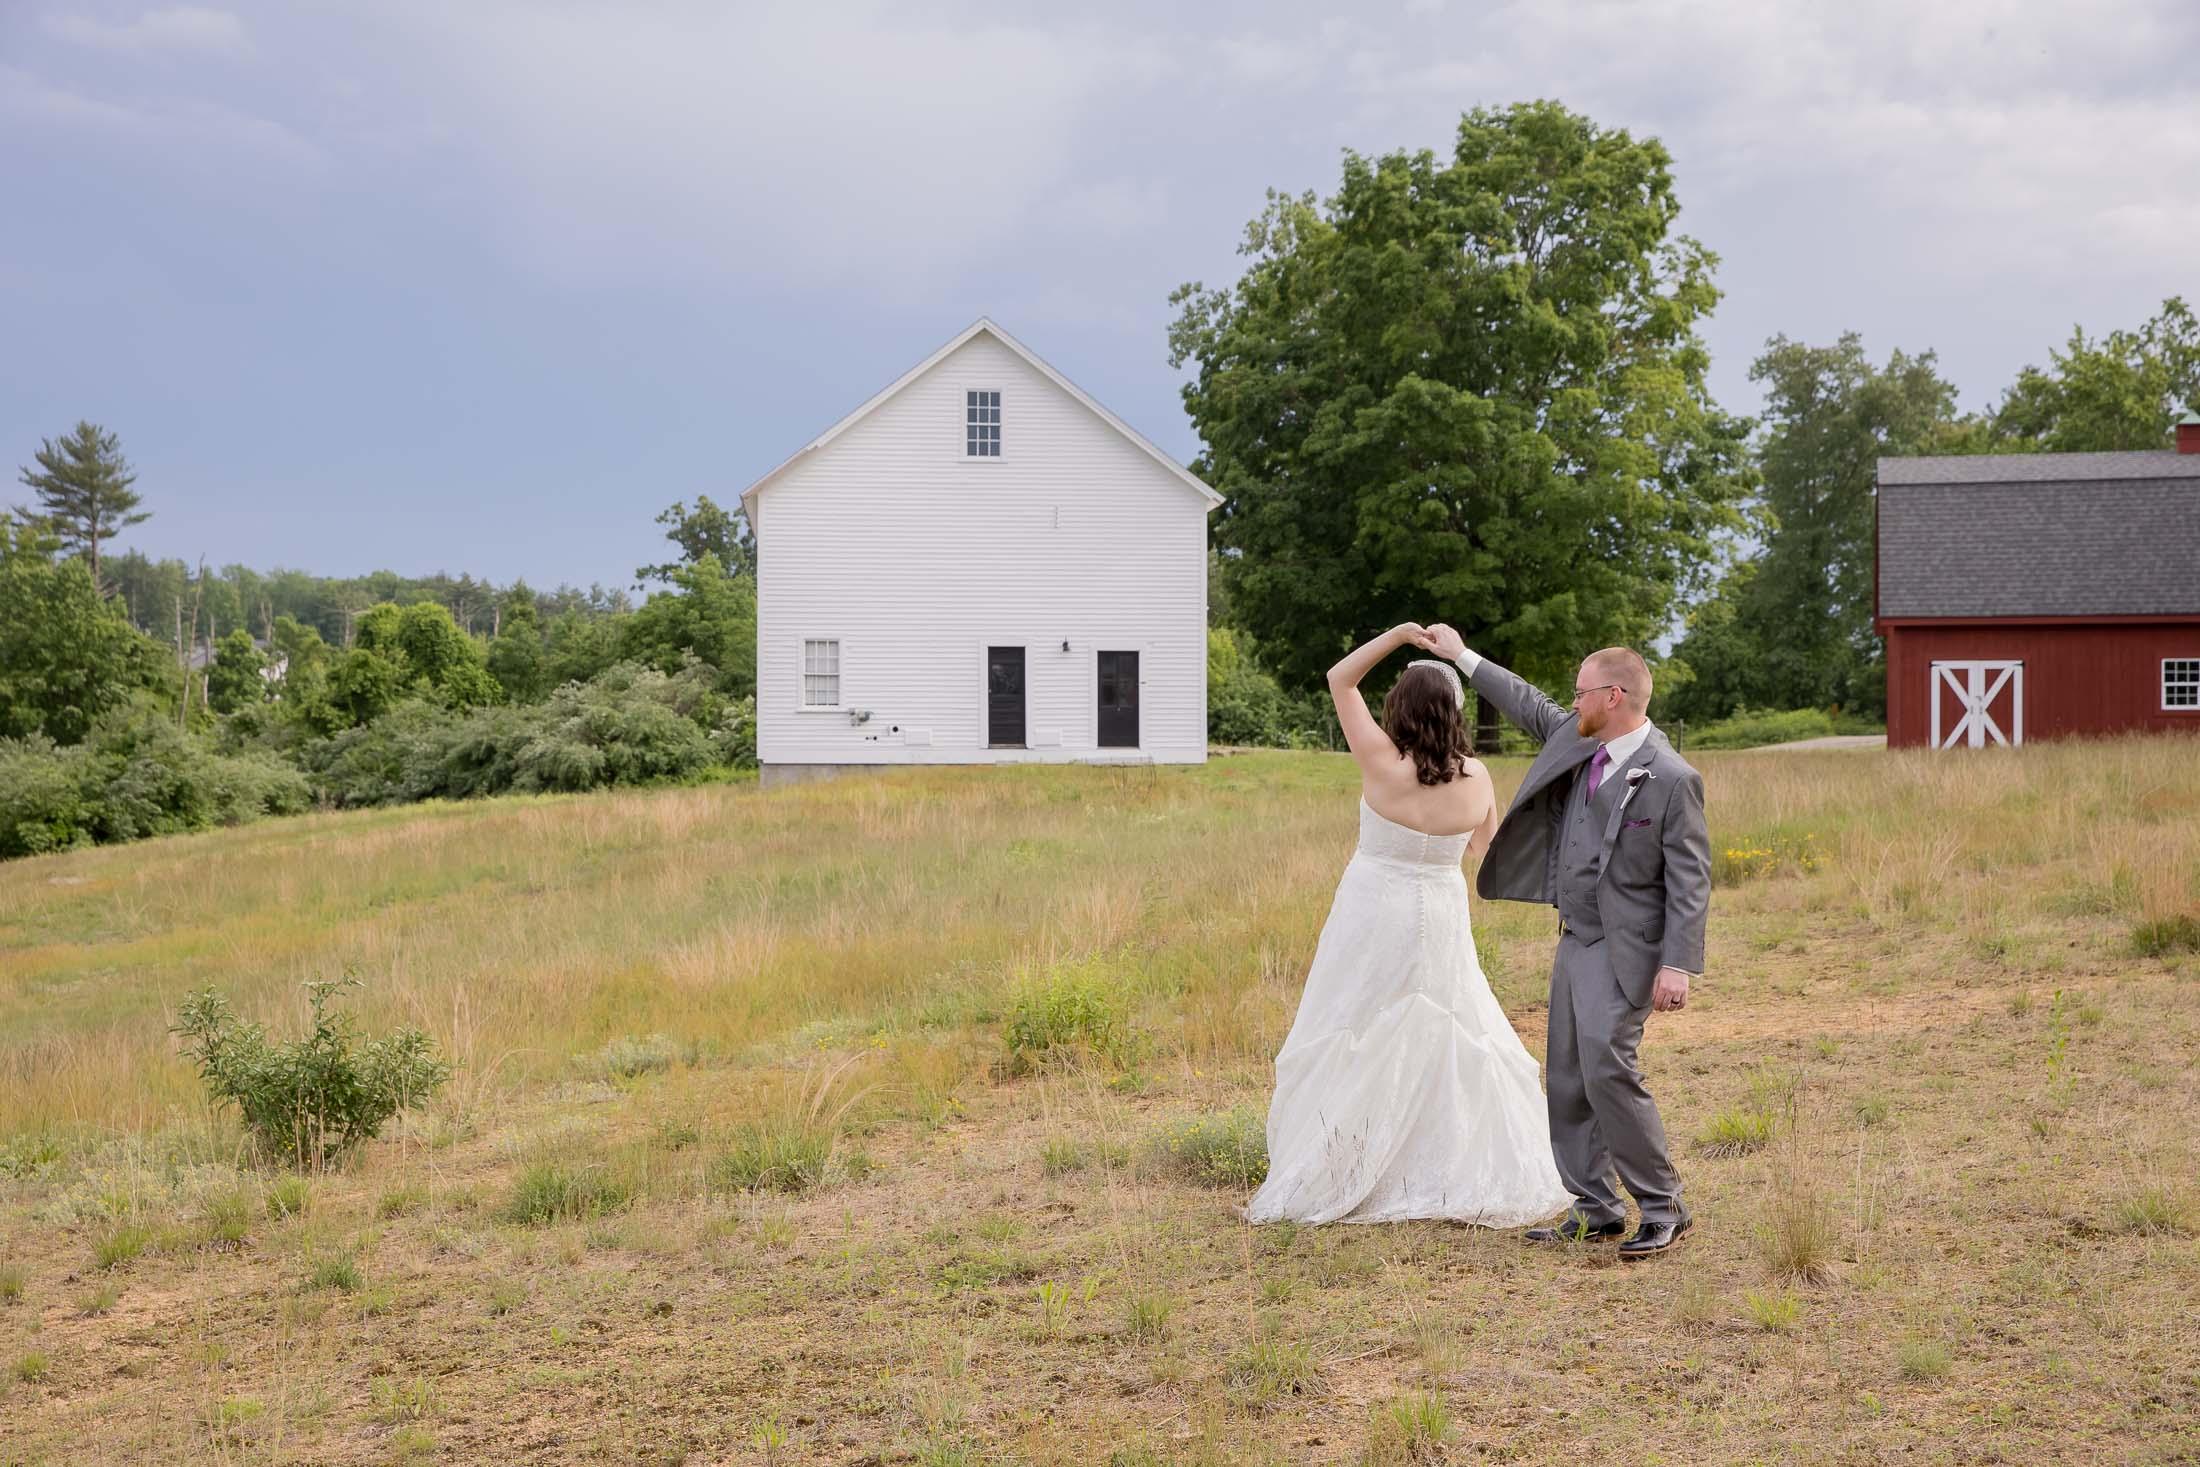 dancing, couple photos, romantic, meadow, wedding, tracy jenkins photography, publick house, Massachusetts, new england,  photography